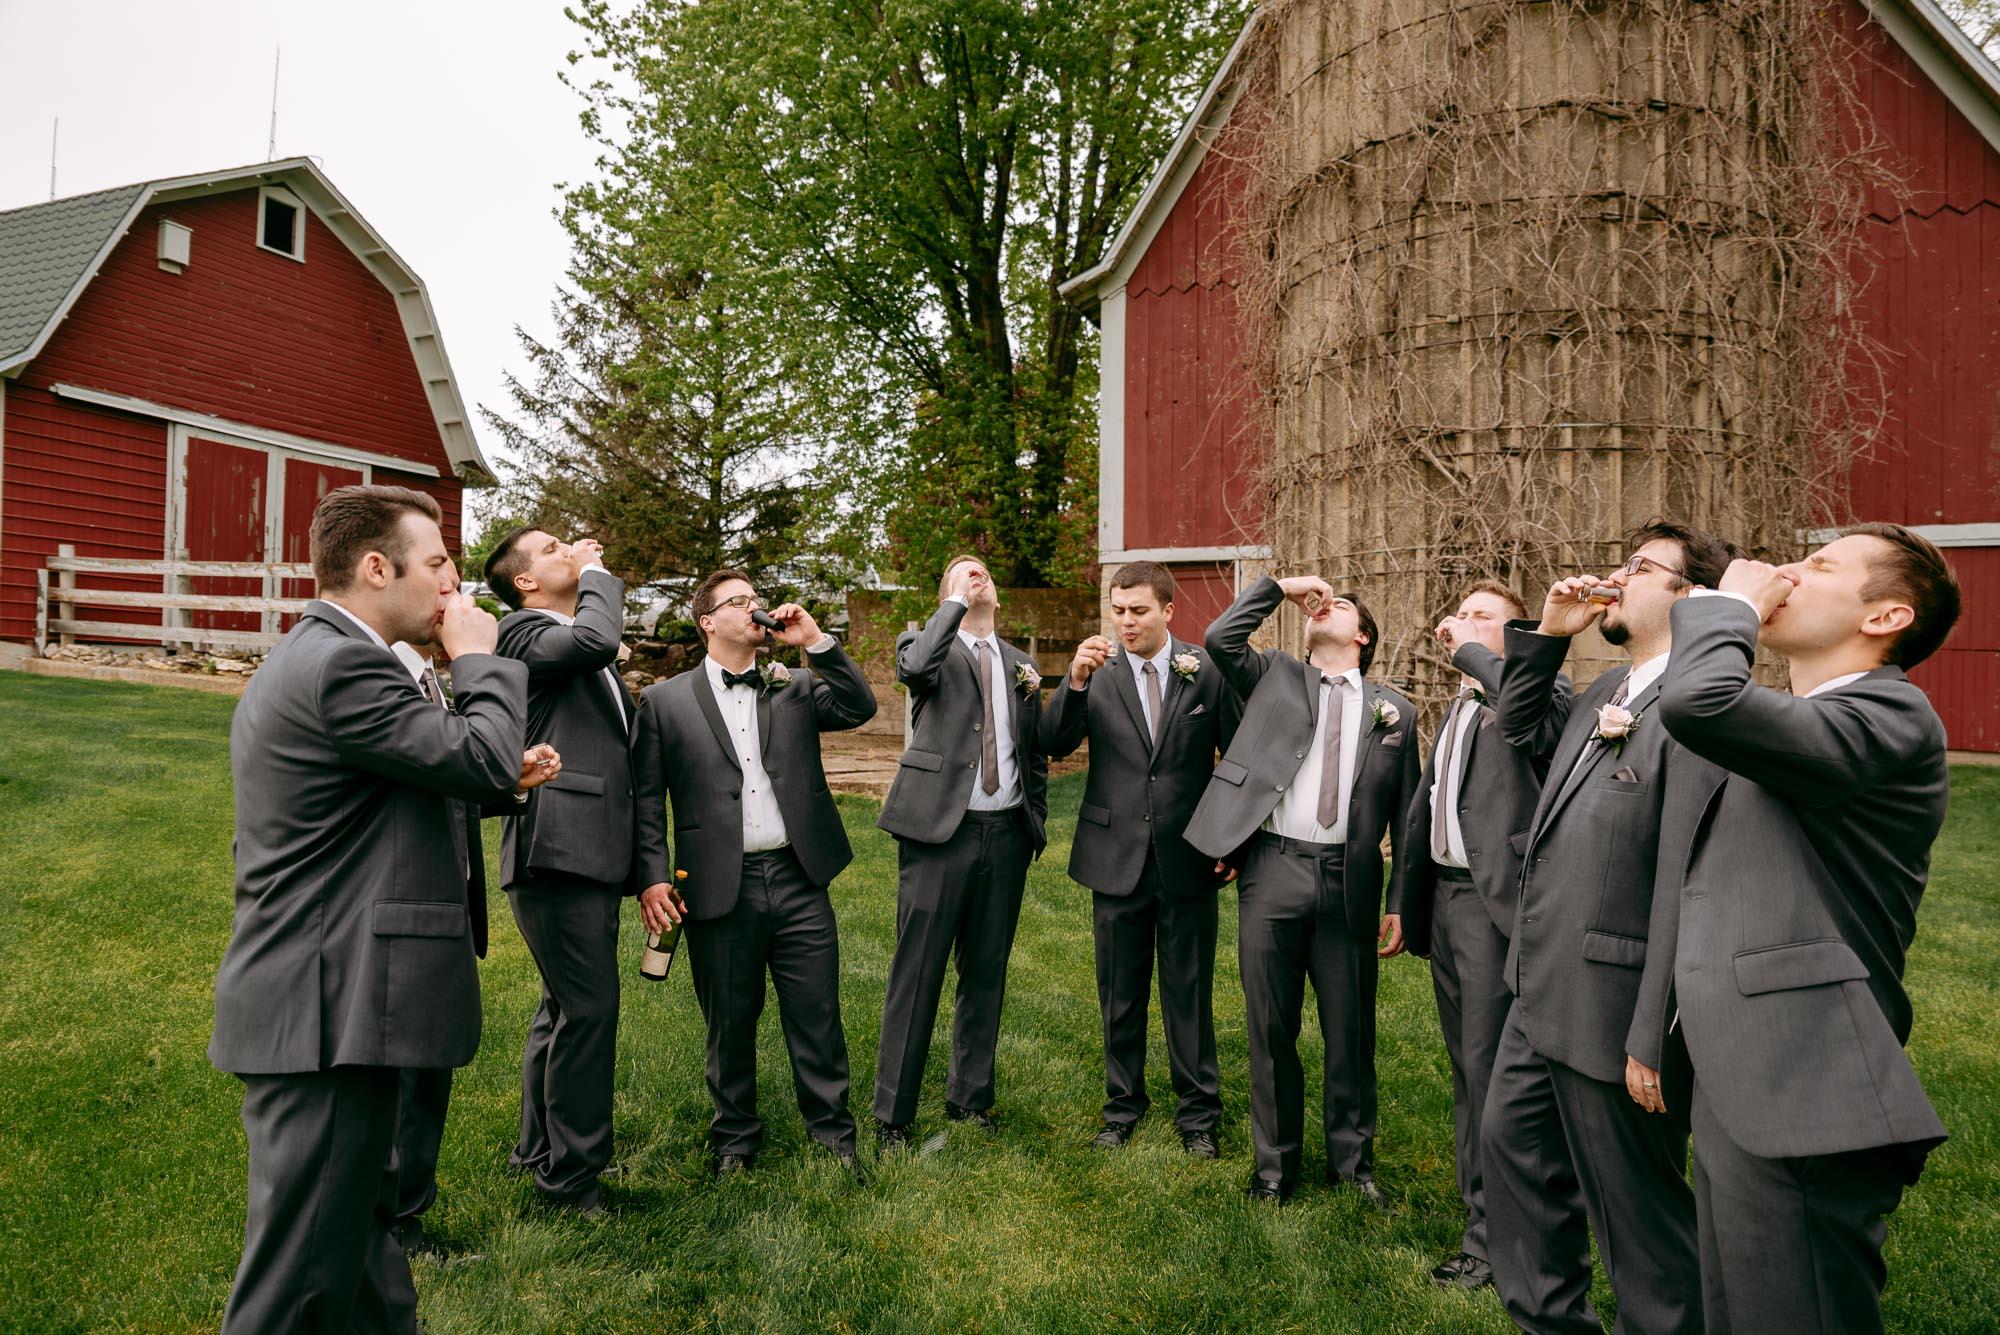 orchard-farms-pavillion-wedding-rockton-IL-wedding-photographers-134.jpg